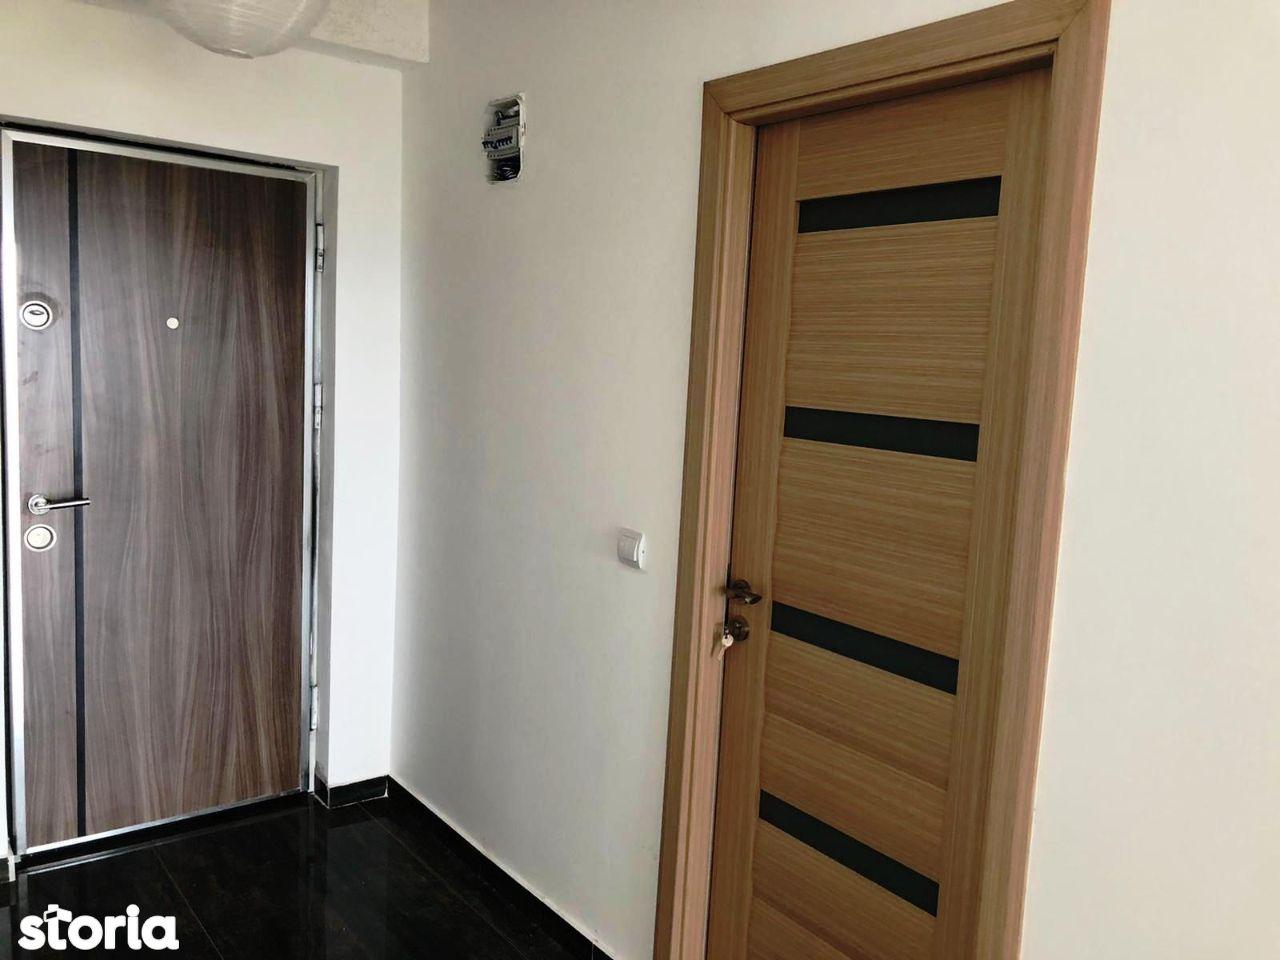 46 000 euro Apartament finisat si Intabulat. Se accepta Credit Bancar